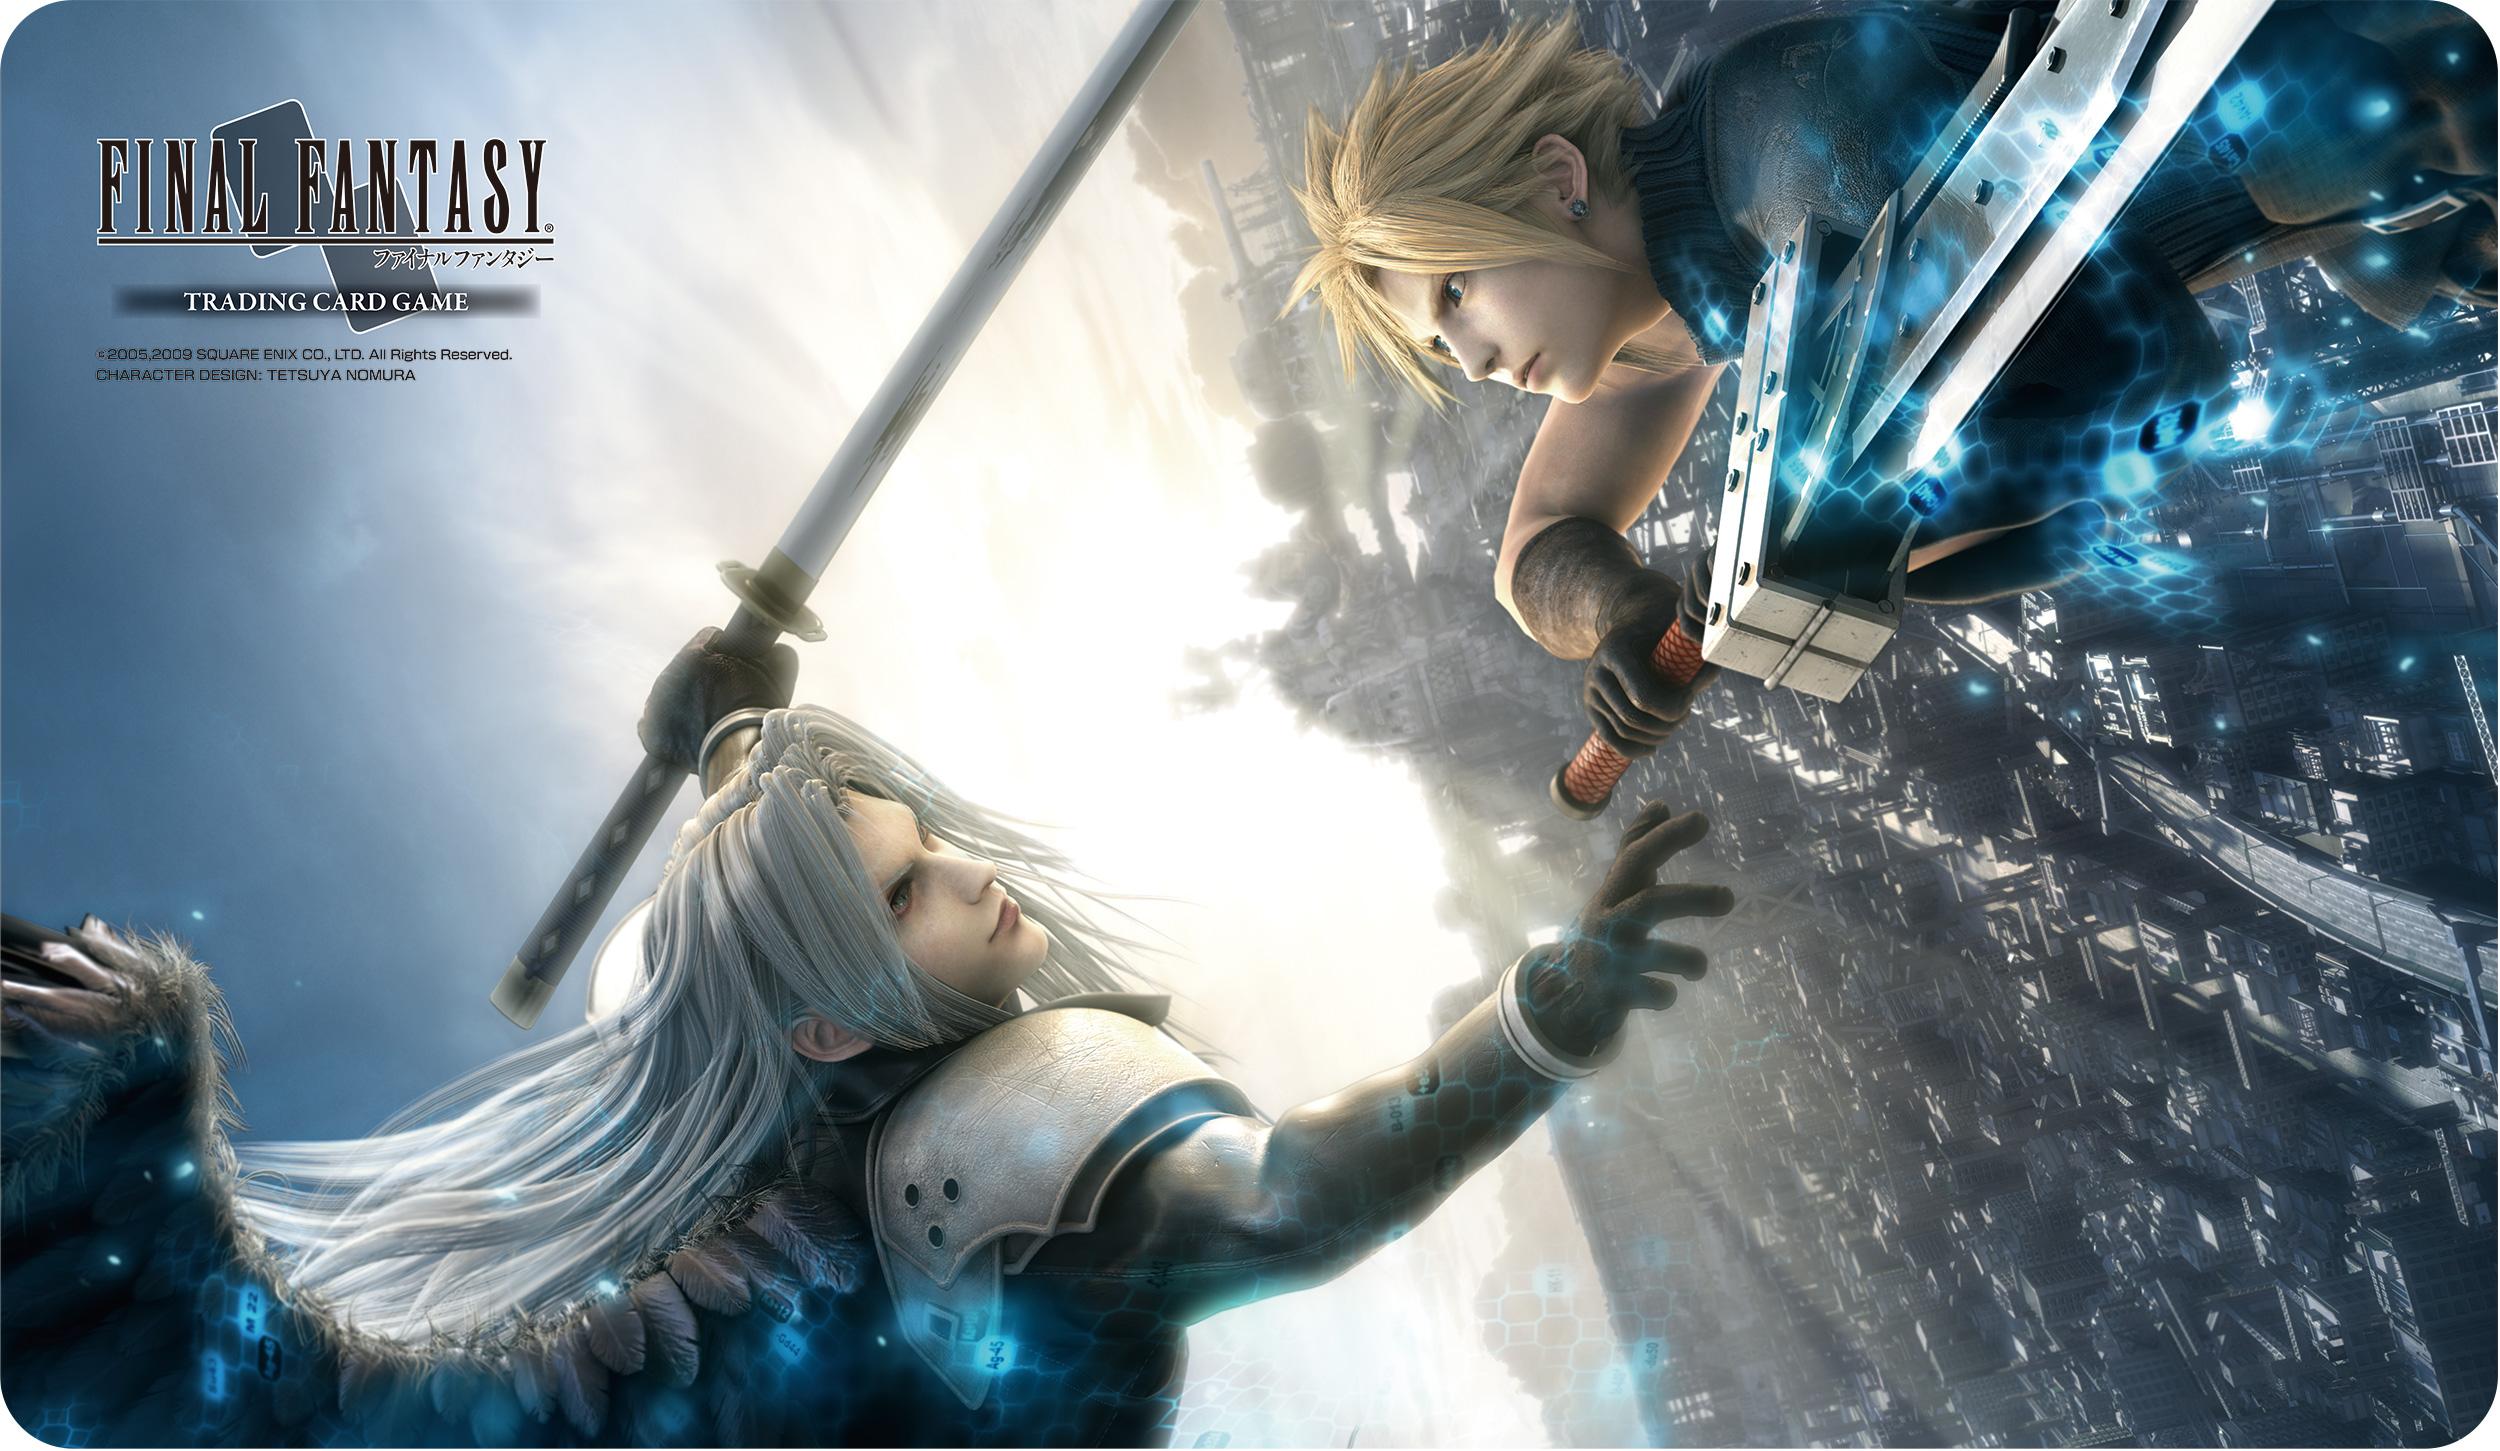 Final Fantasy Trading Card Game Premium Quality Play Mat Final Fantasy Vii Advent Children Cloud Sephiroth Square Enix Store